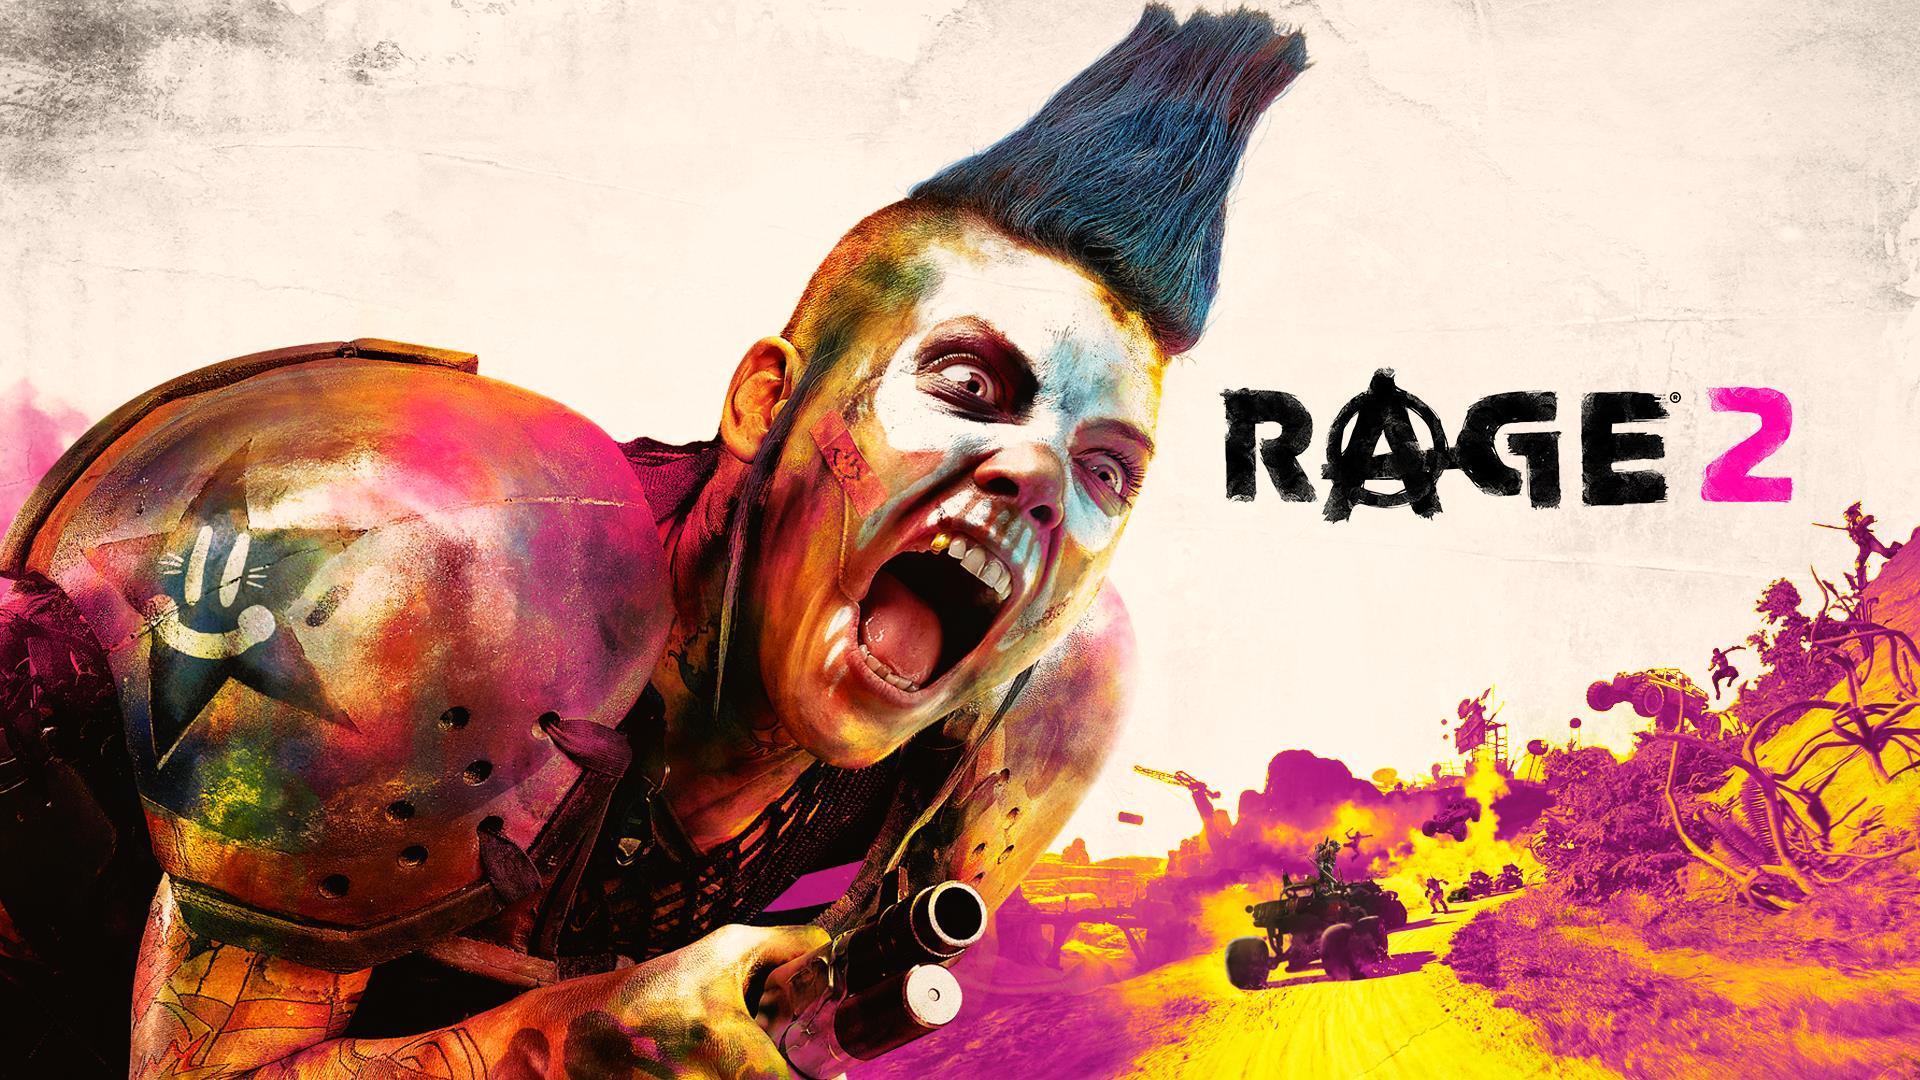 Rage 2 Video Game